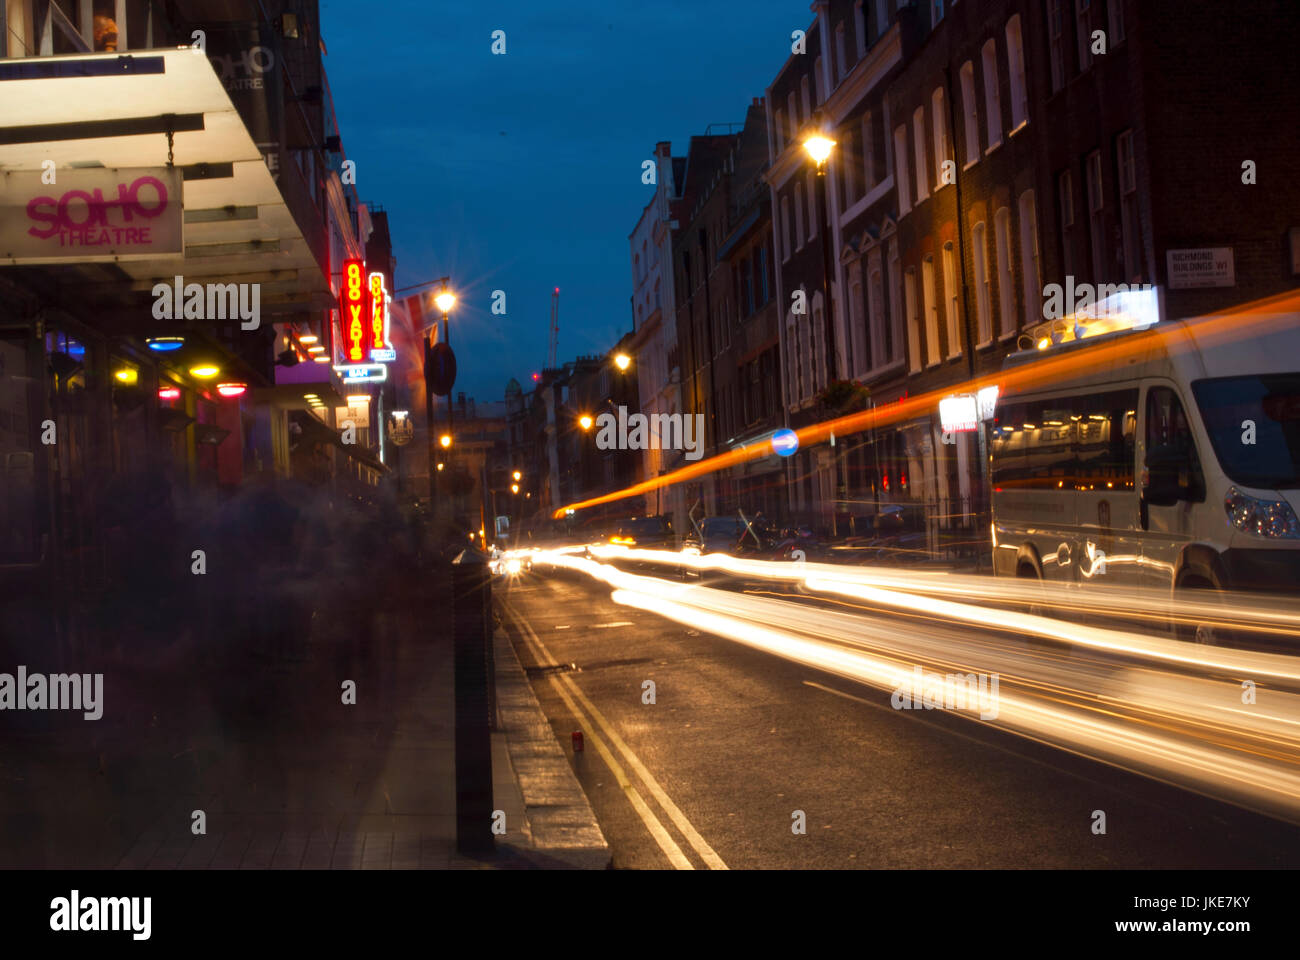 Dean Street at night long exposure - Stock Image